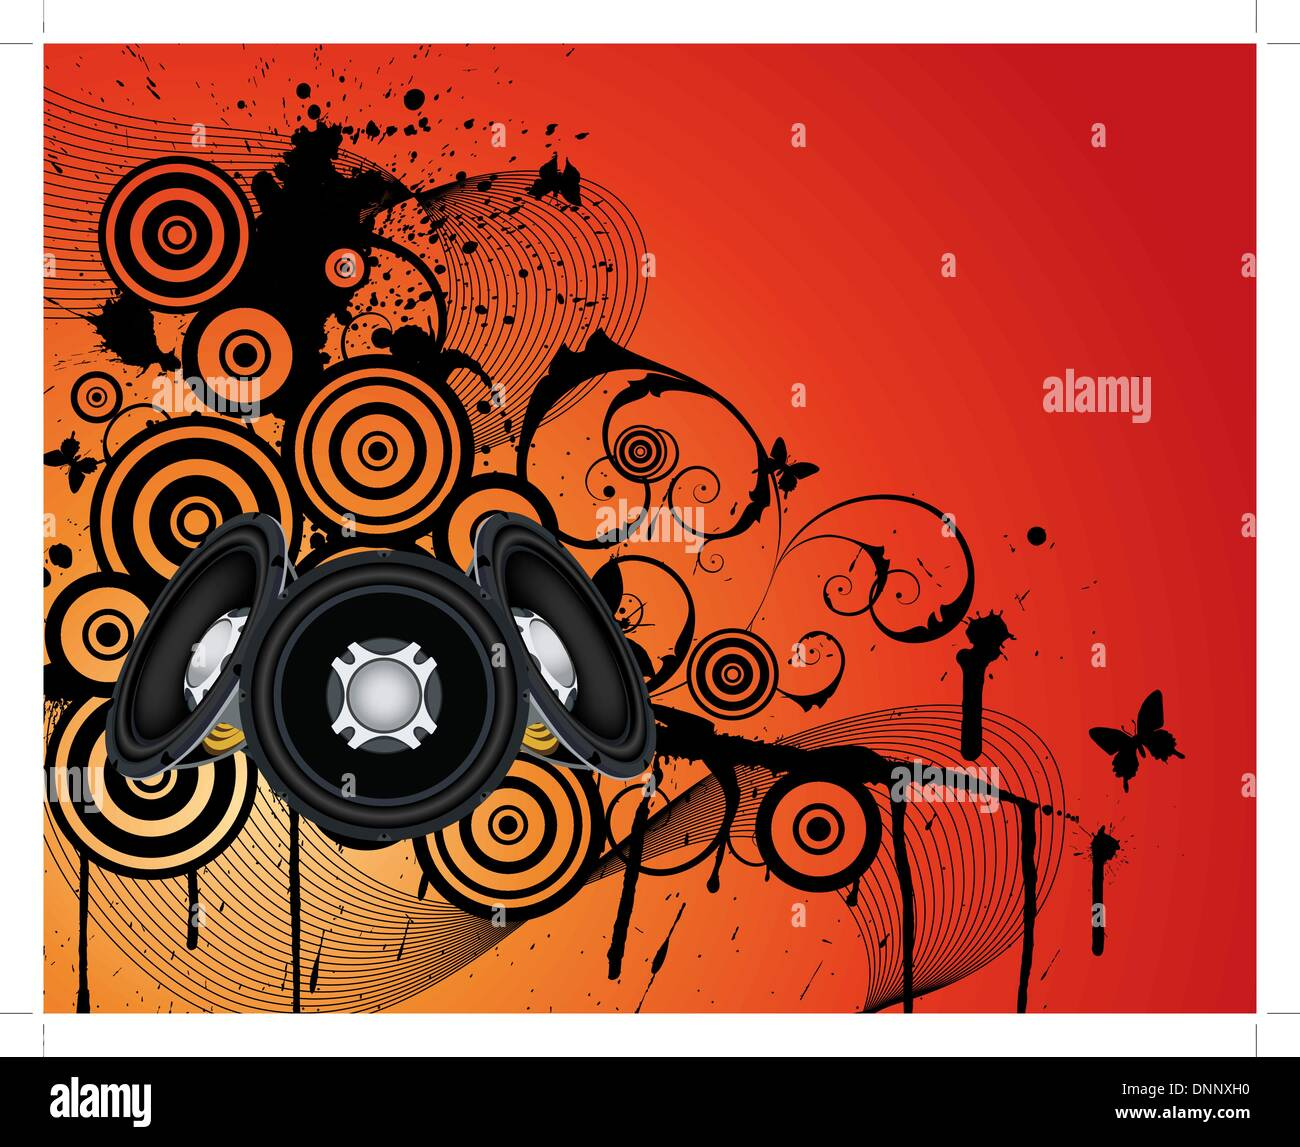 Grunge musicale di sottofondo. EPS 10 vectorillustration wthout trasparenza. Immagini Stock